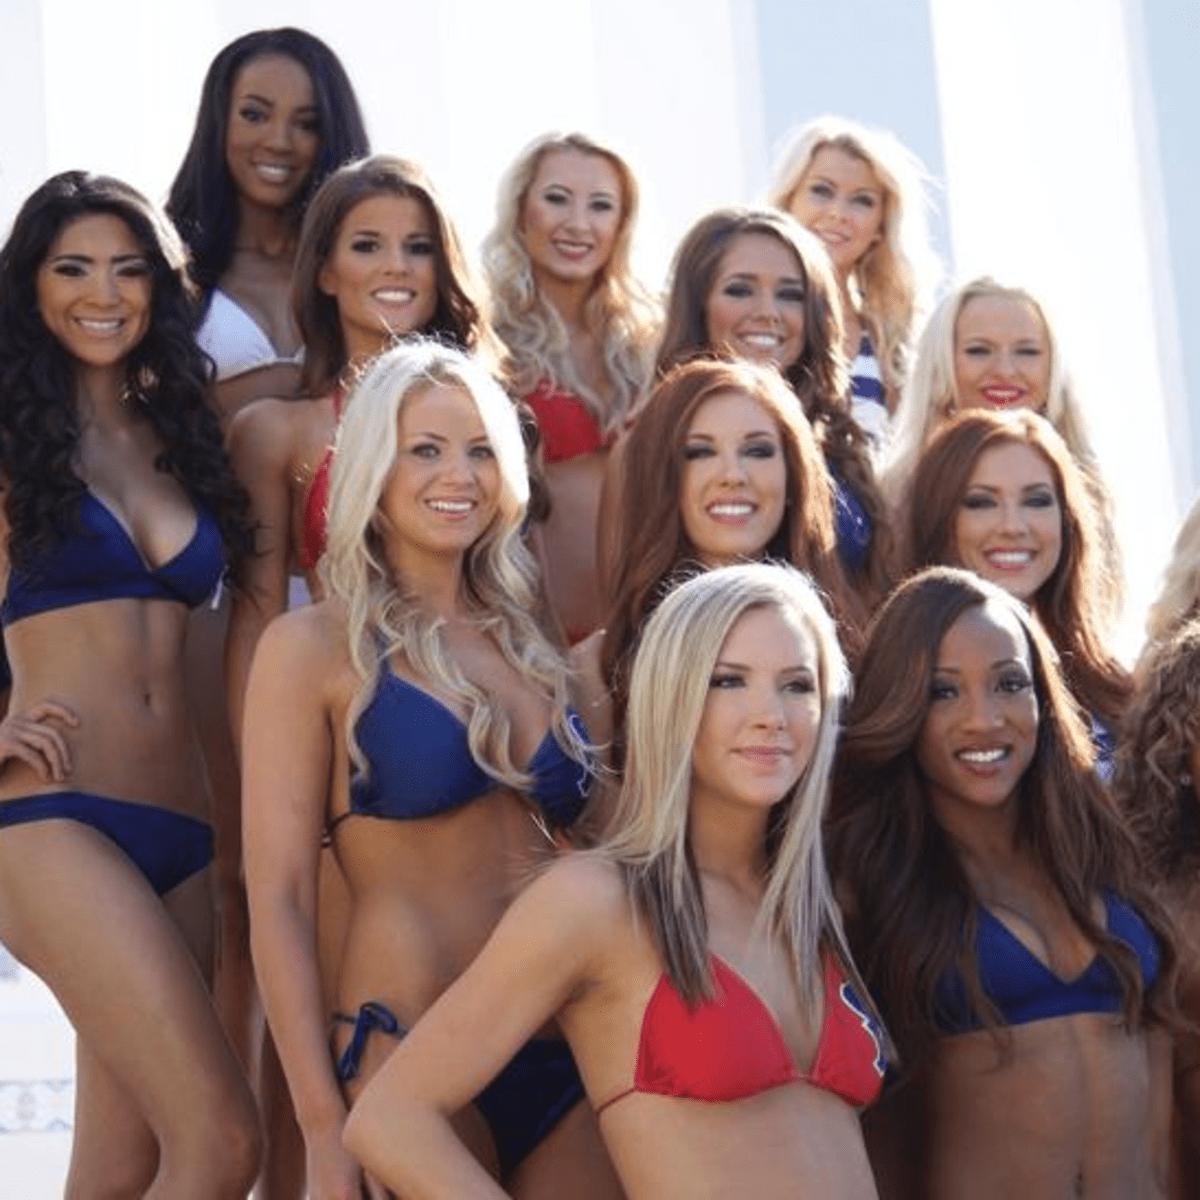 Houston Texans cheerleaders calendar